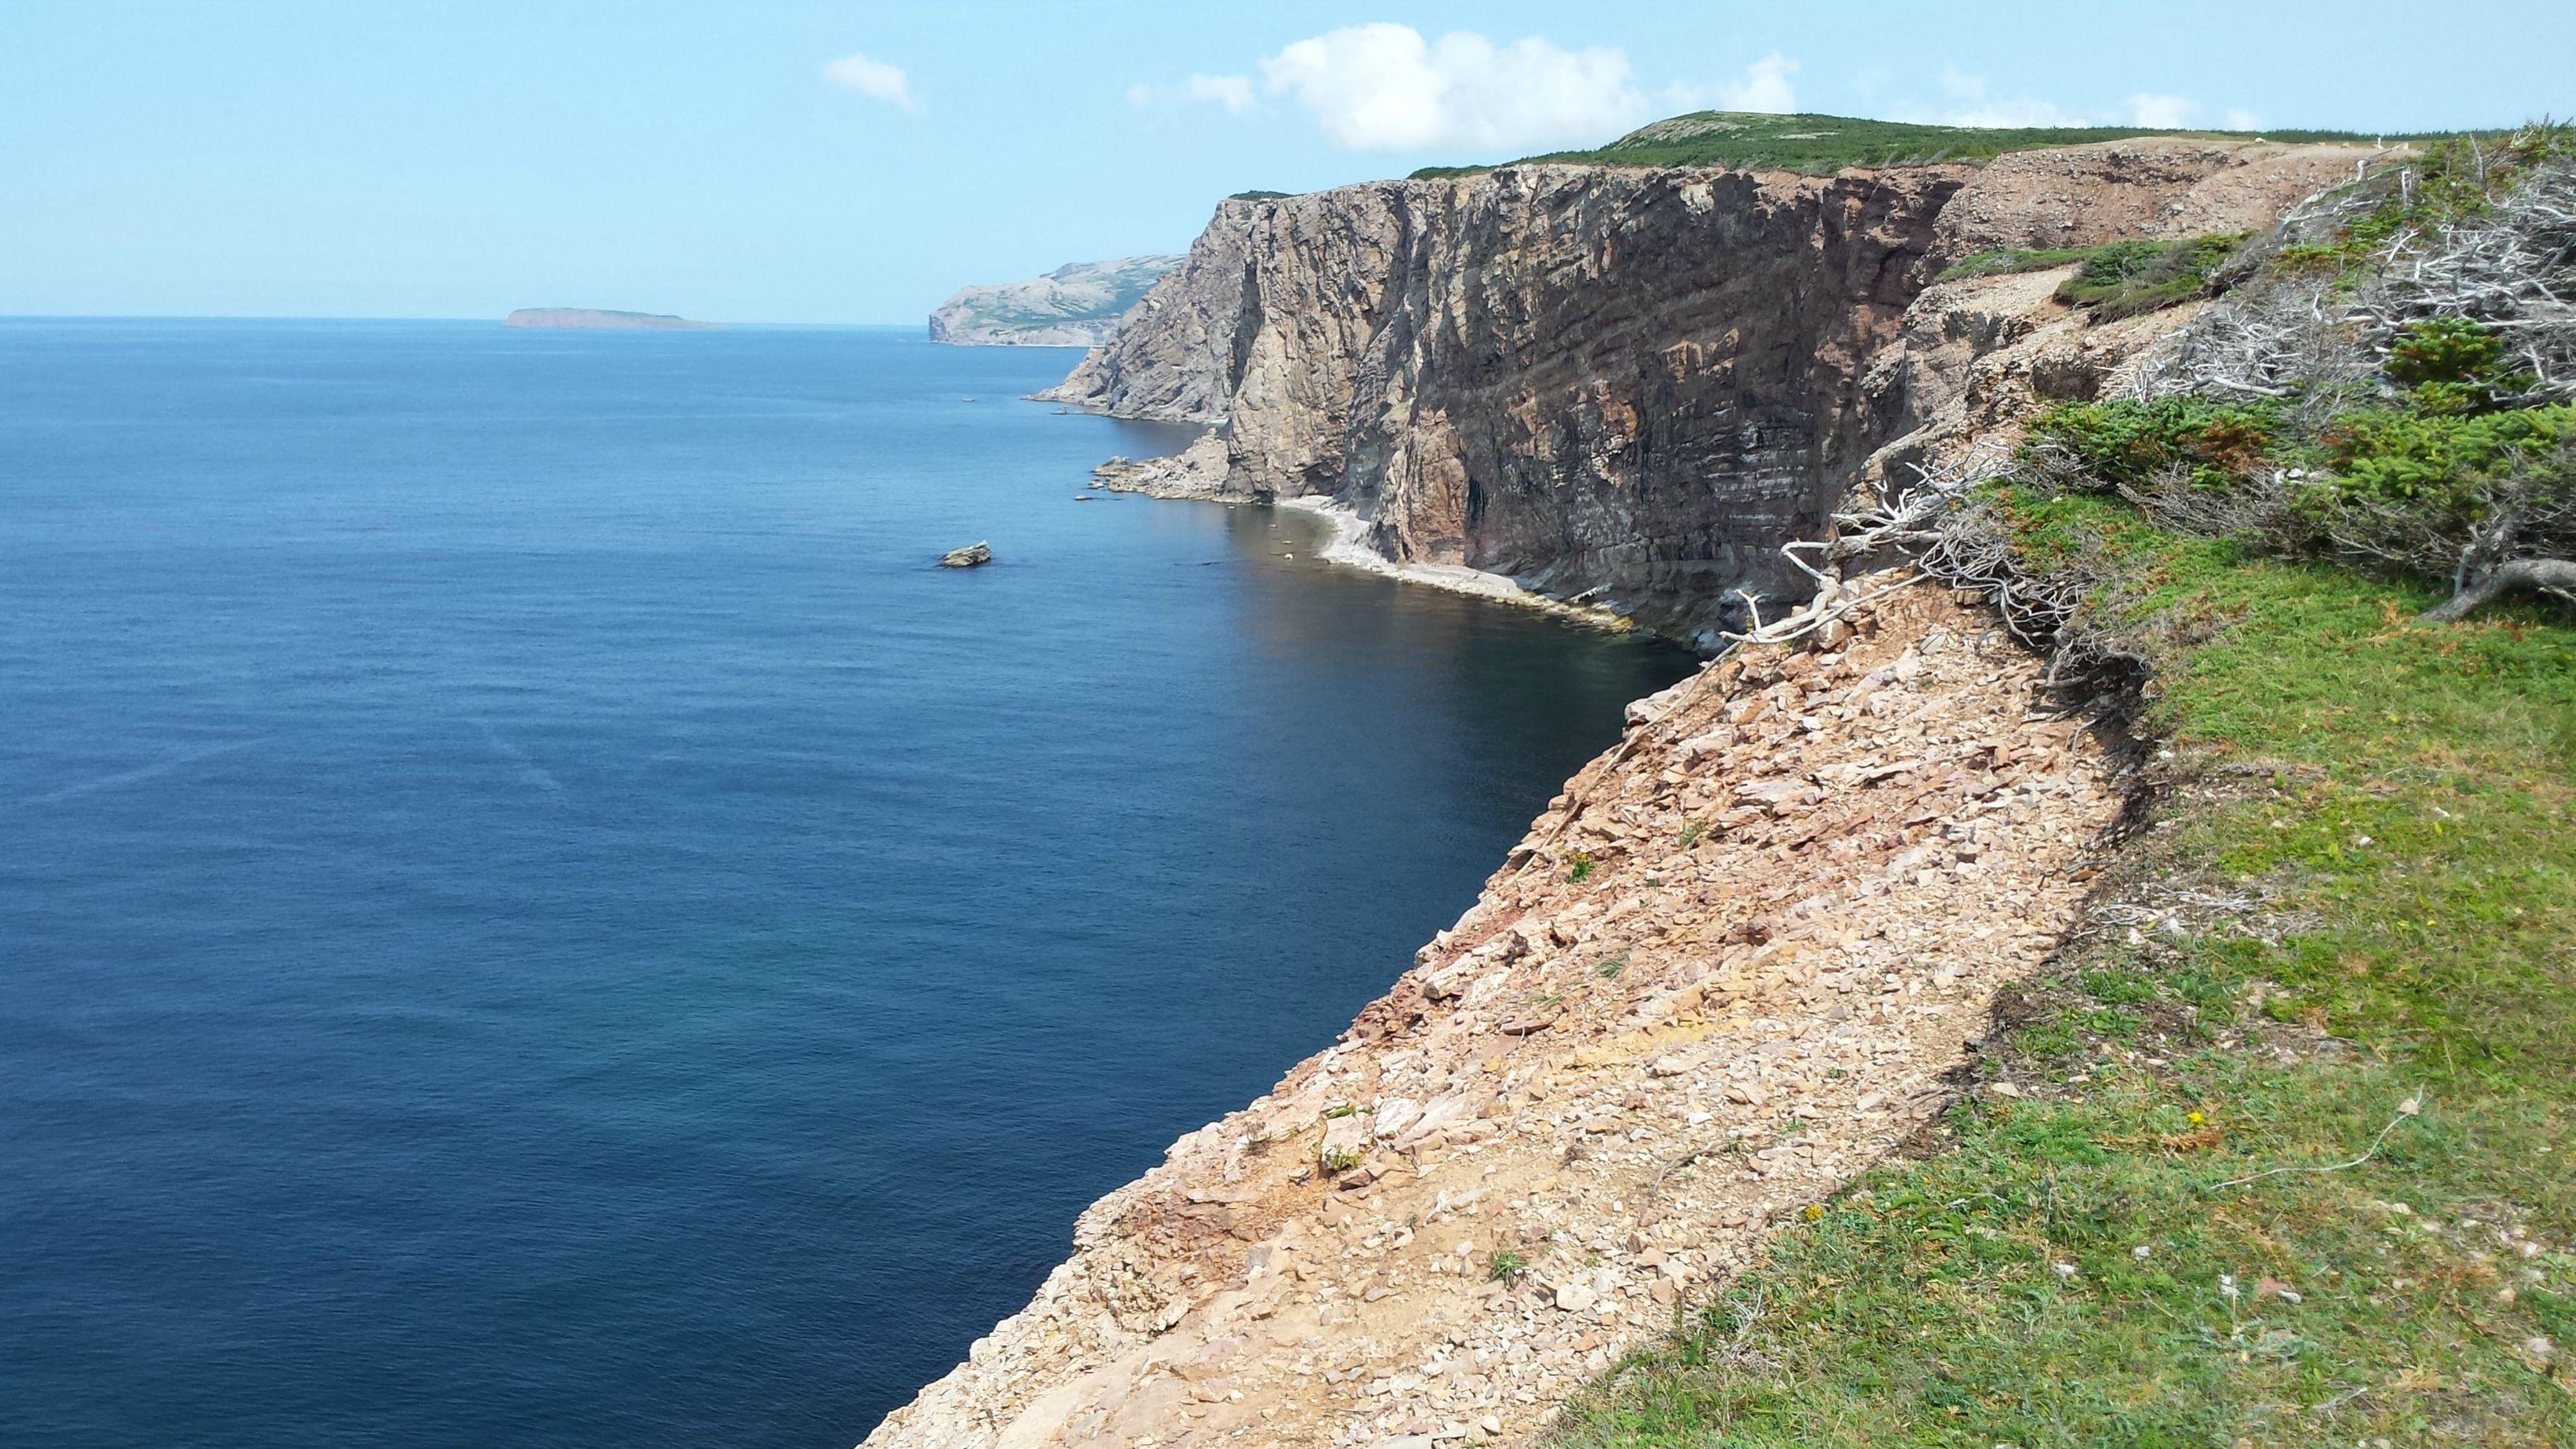 Cape St. George, Newfoundland